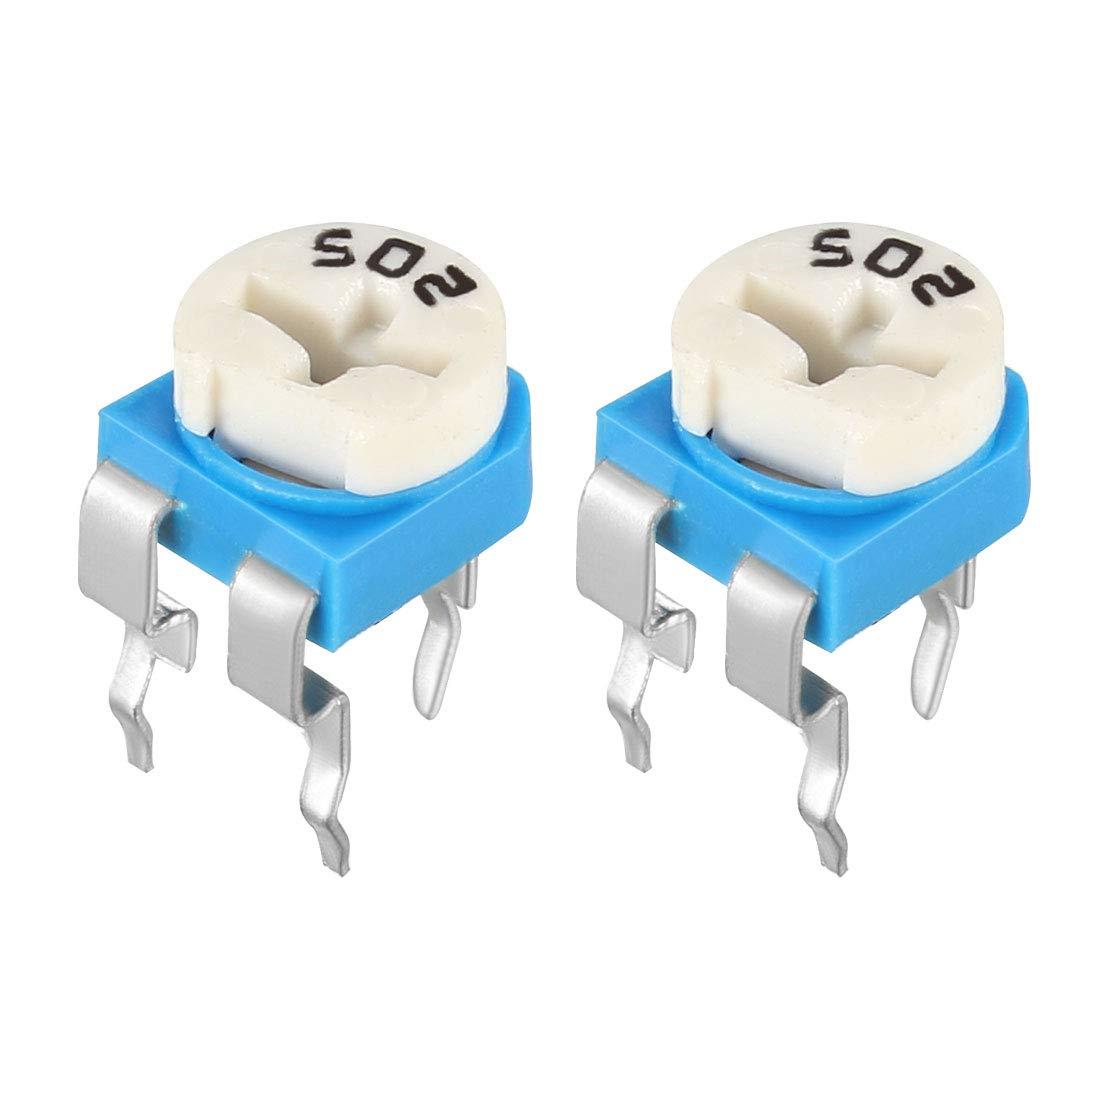 uxcell 50 Pcs 50K Ohm Variable Resistors Top Adjustable Horizontal Cermet Potentiometer